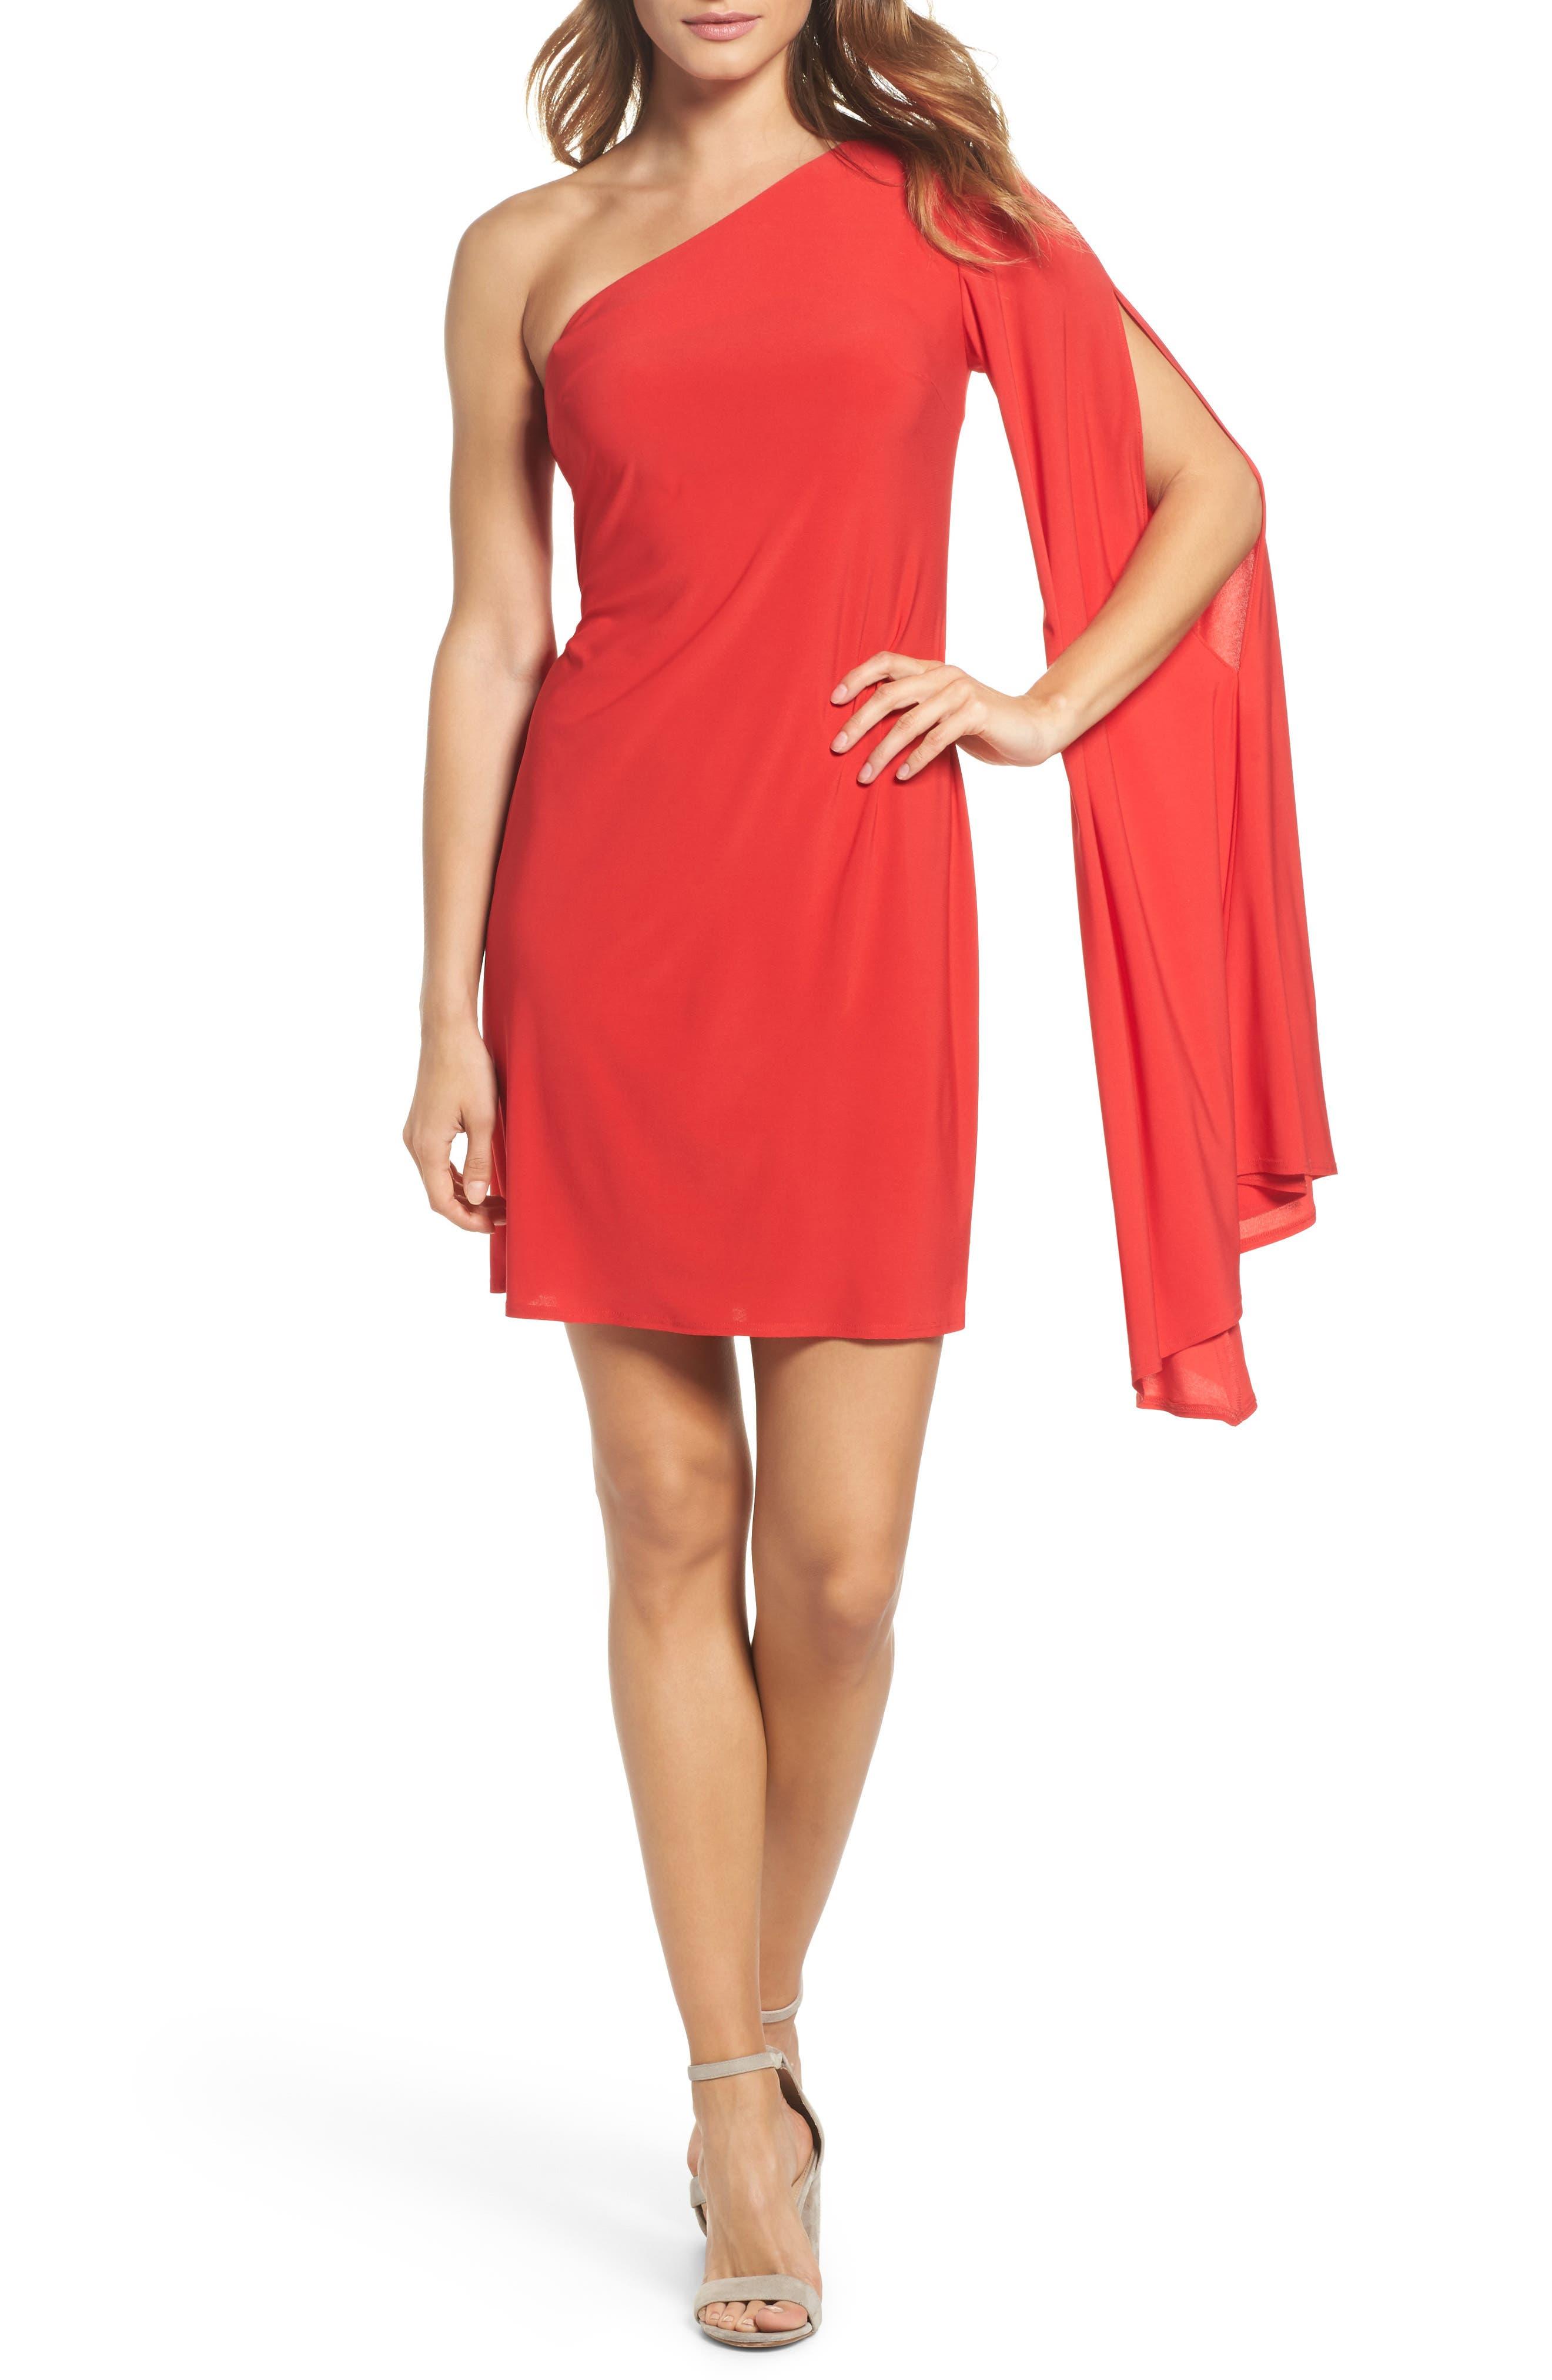 Musa One-Shoulder Dress,                             Main thumbnail 1, color,